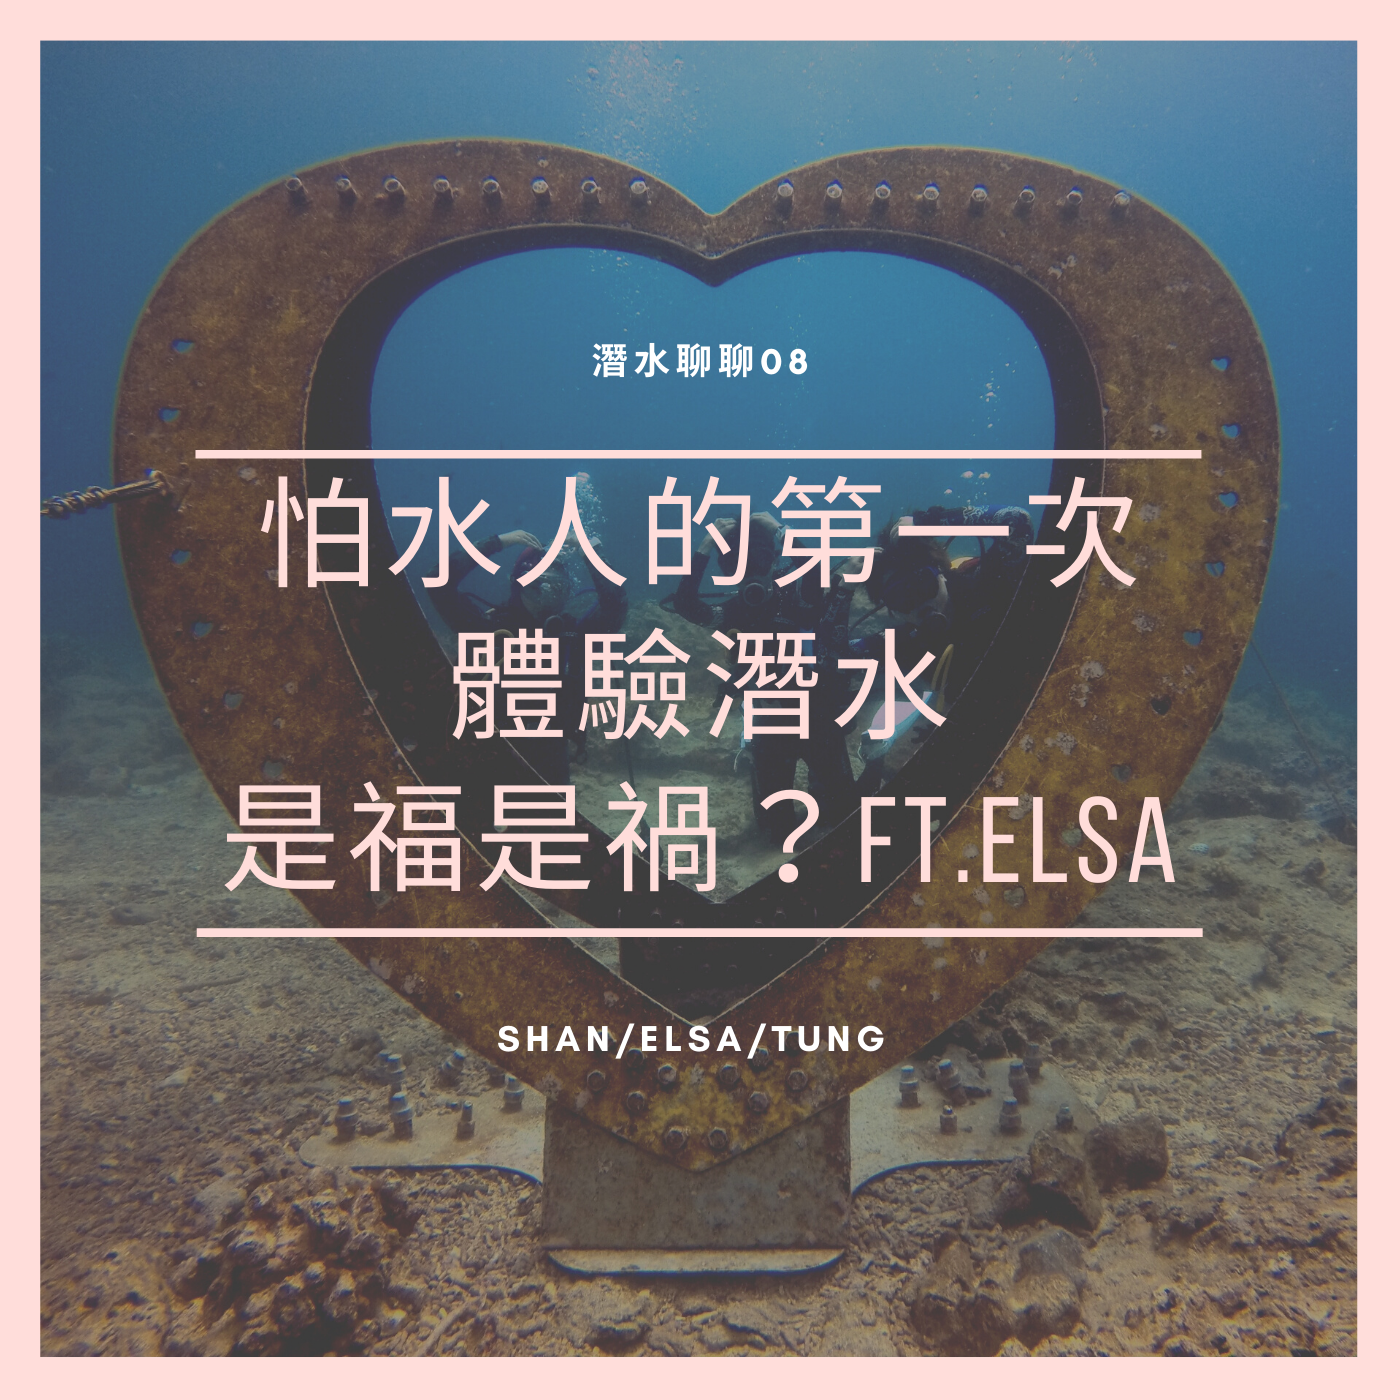 EP31 潛水聊聊08:怕水人的第一次體驗潛水是福是禍?ft. Elsa